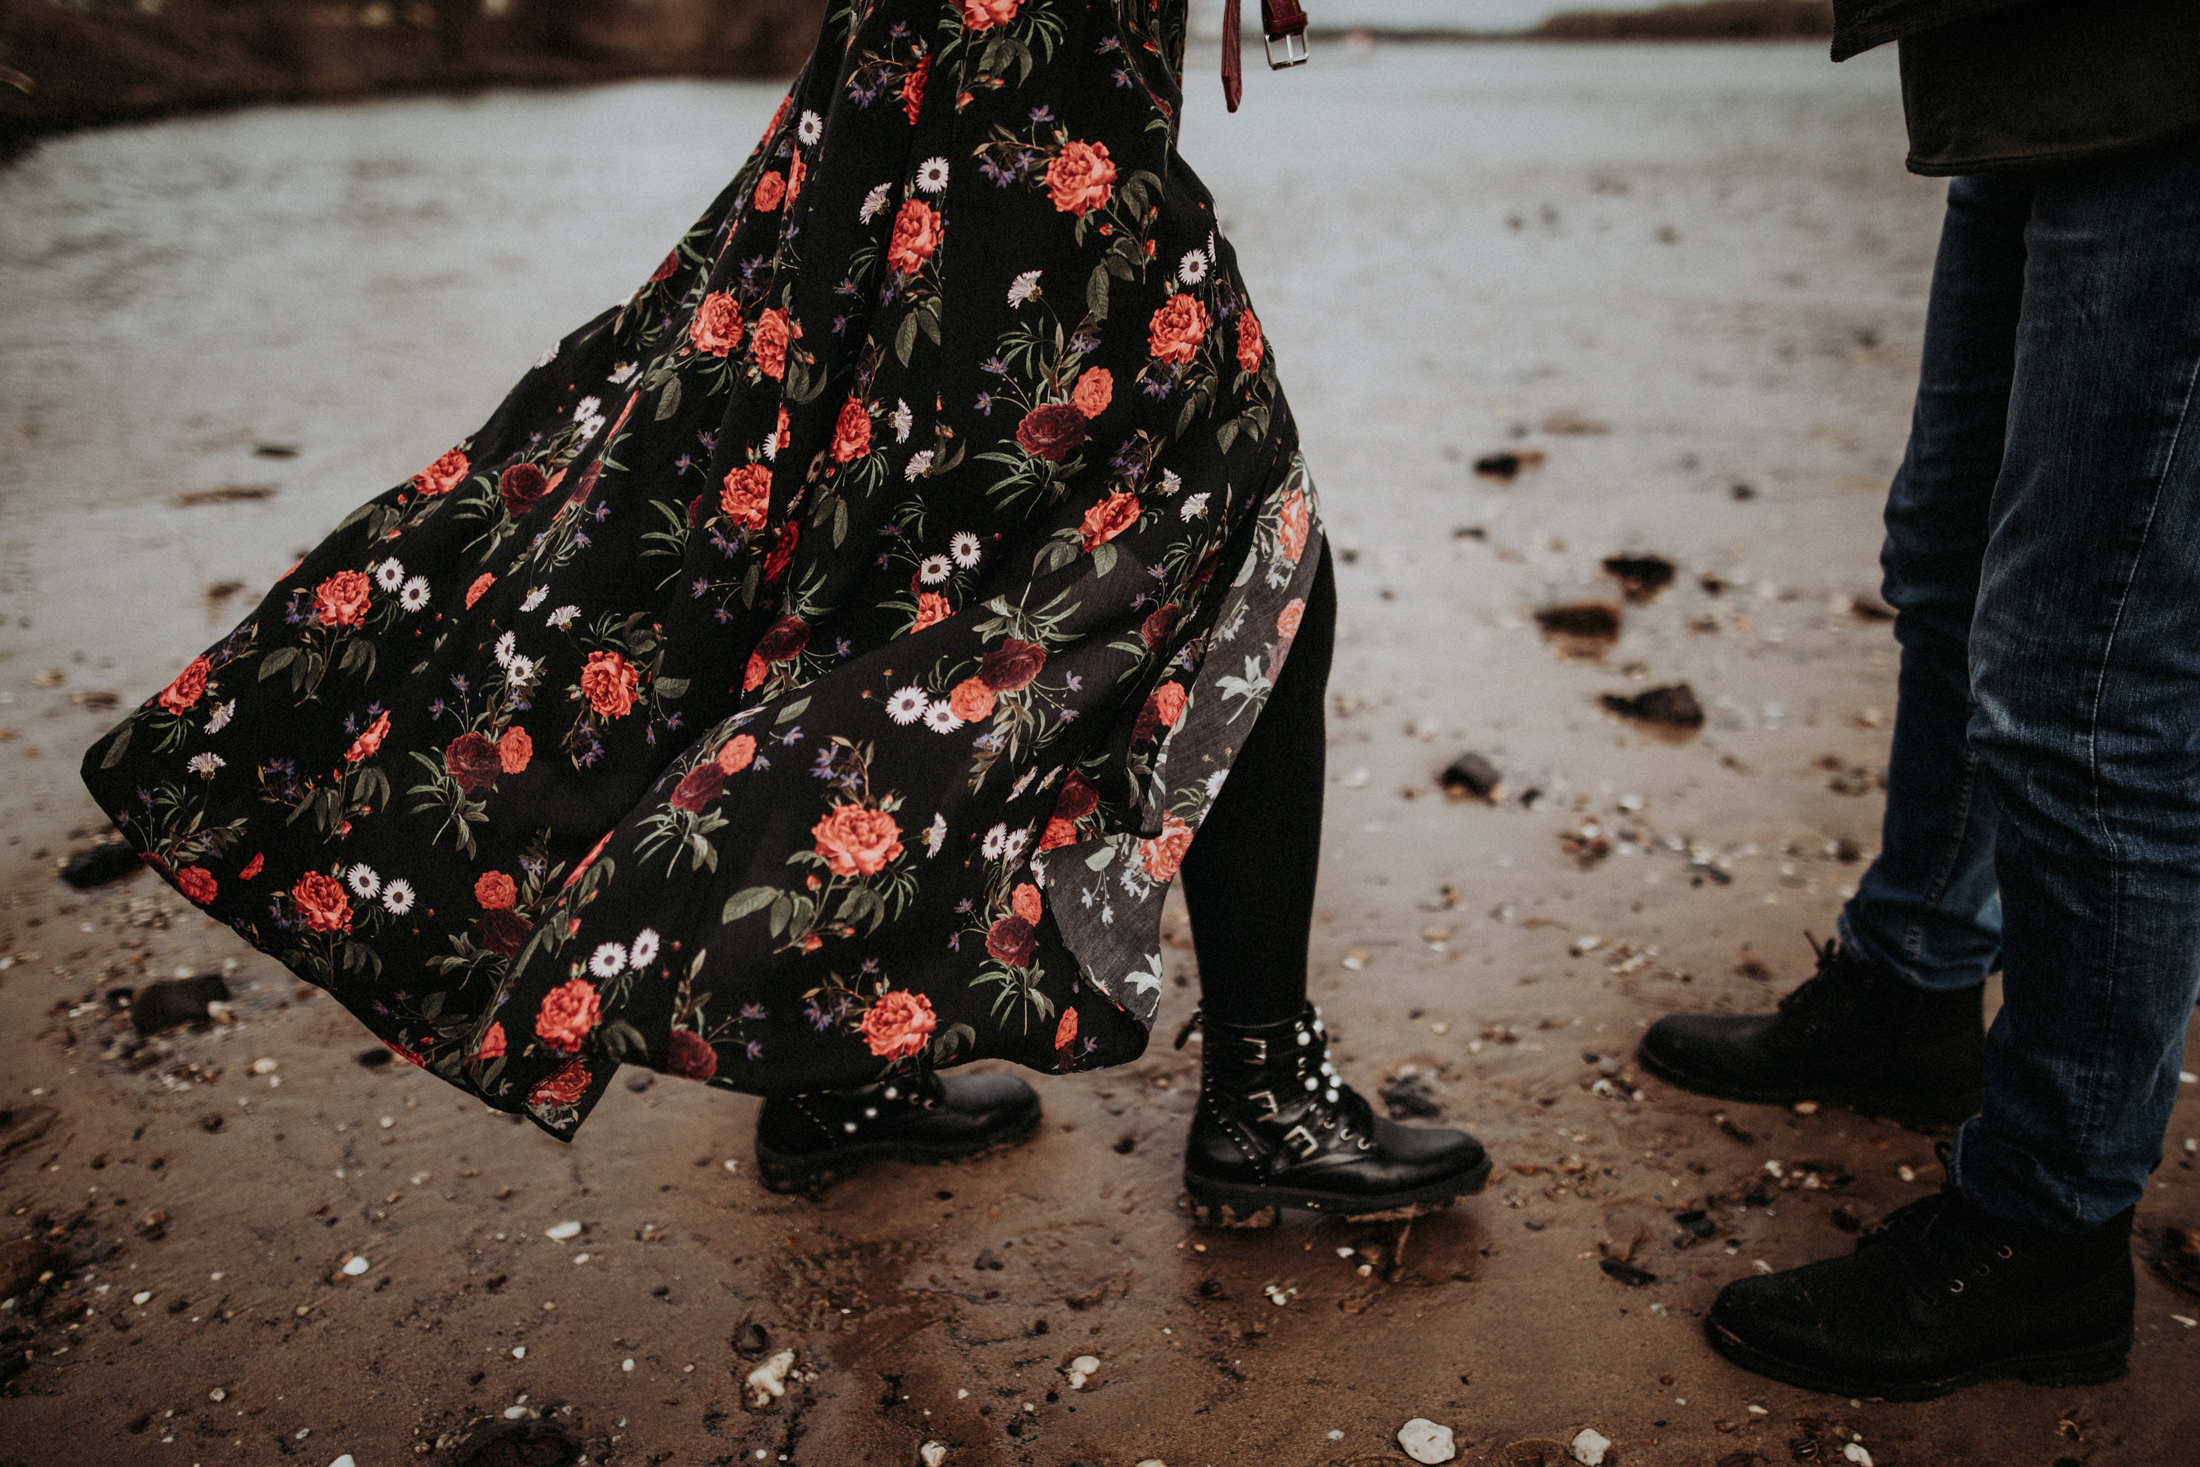 Wedding_Photographer_Mallorca_DanielaMarquardt_Photography_CanaryIslands_Lanzarote_Iceland_Tuscany_Santorini_Portugal_NewYork_Spain_Elopement_Hochzeitsfotograf_CK28